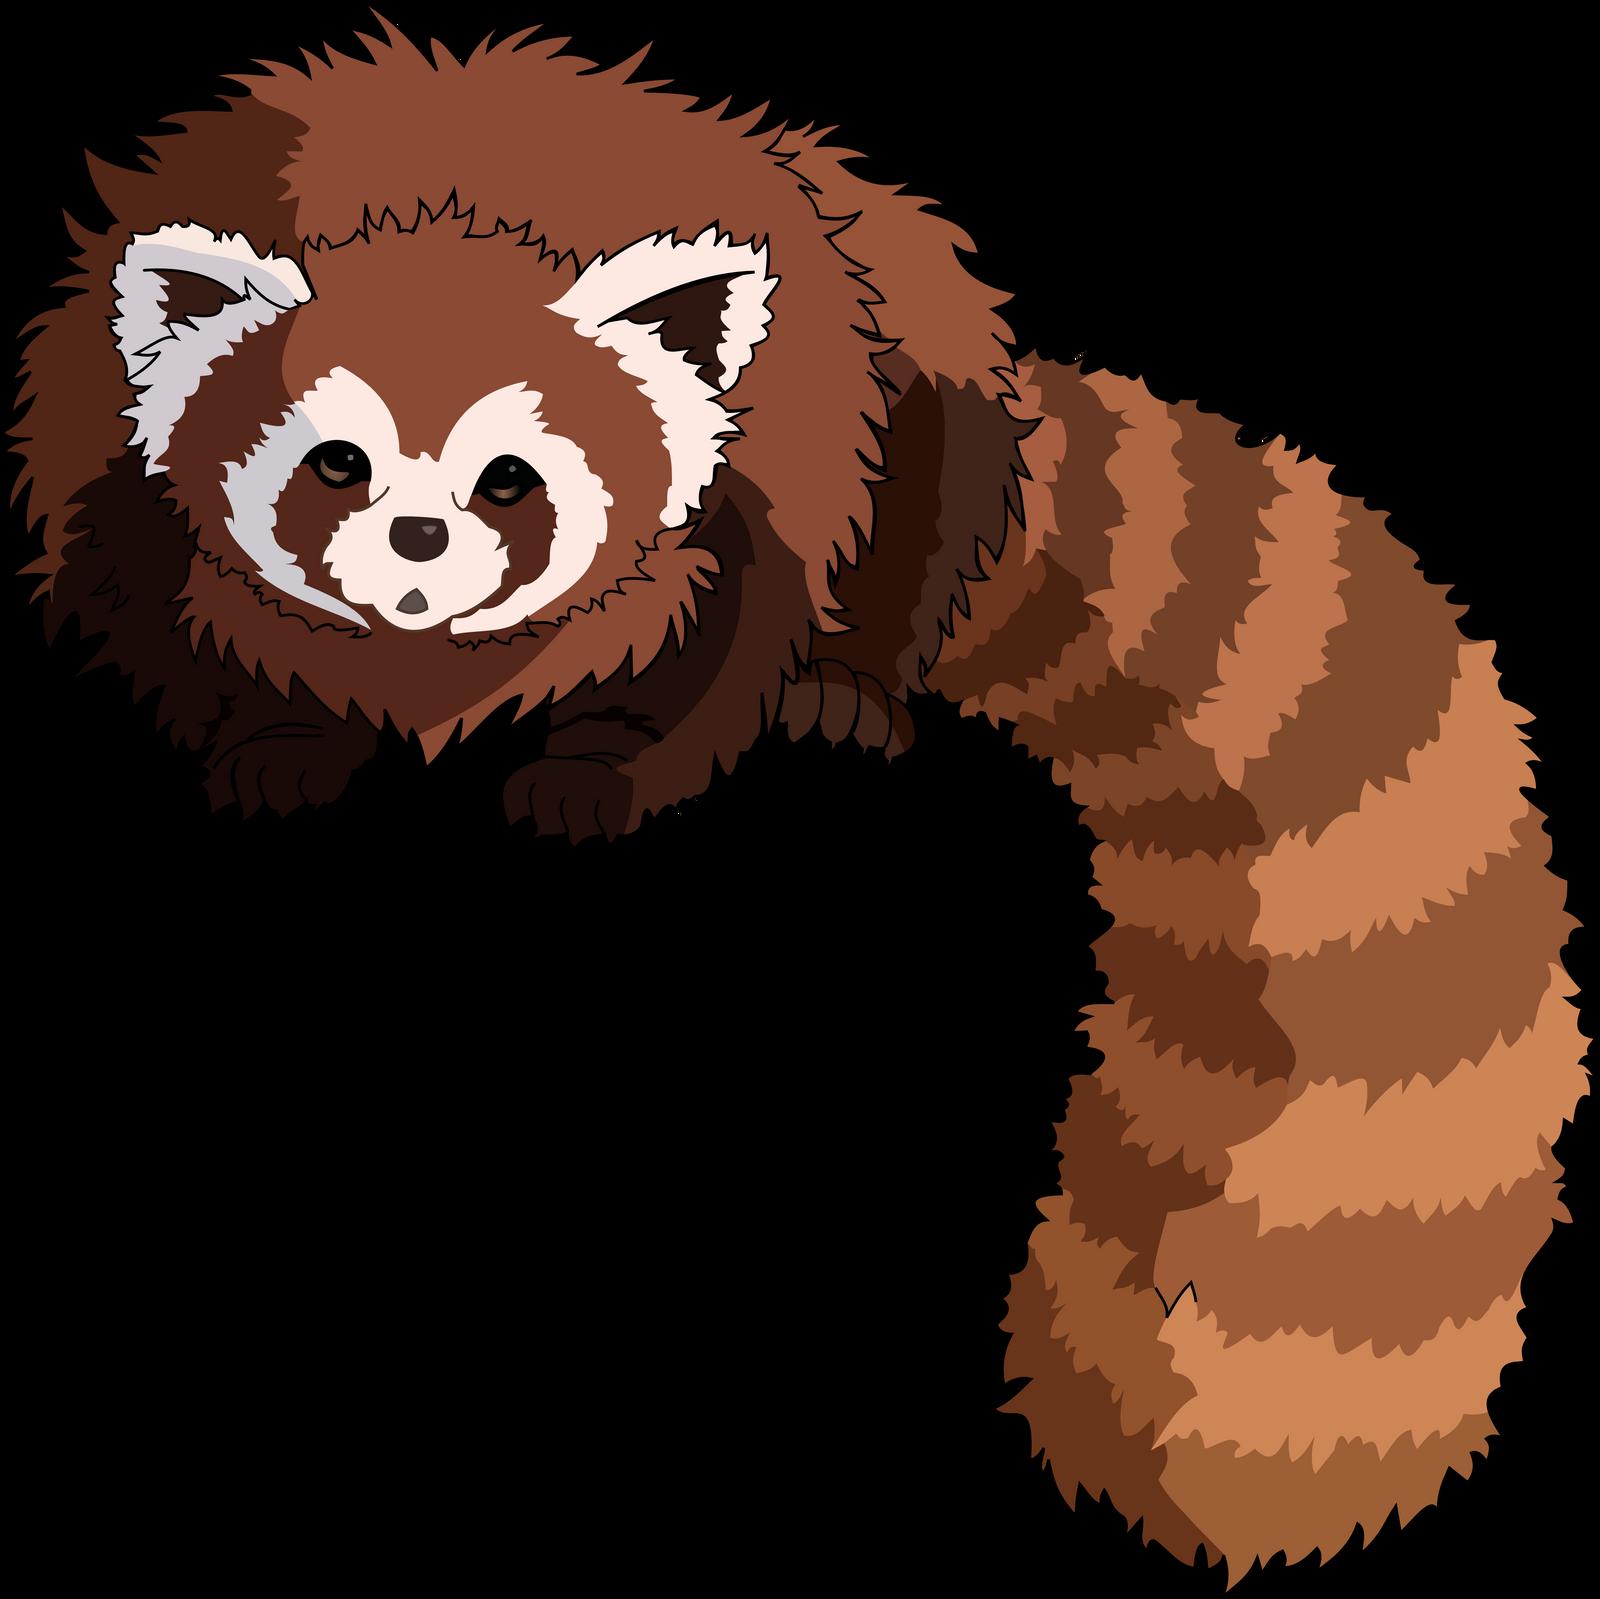 Fuzzy Pabu by FinalFlutter